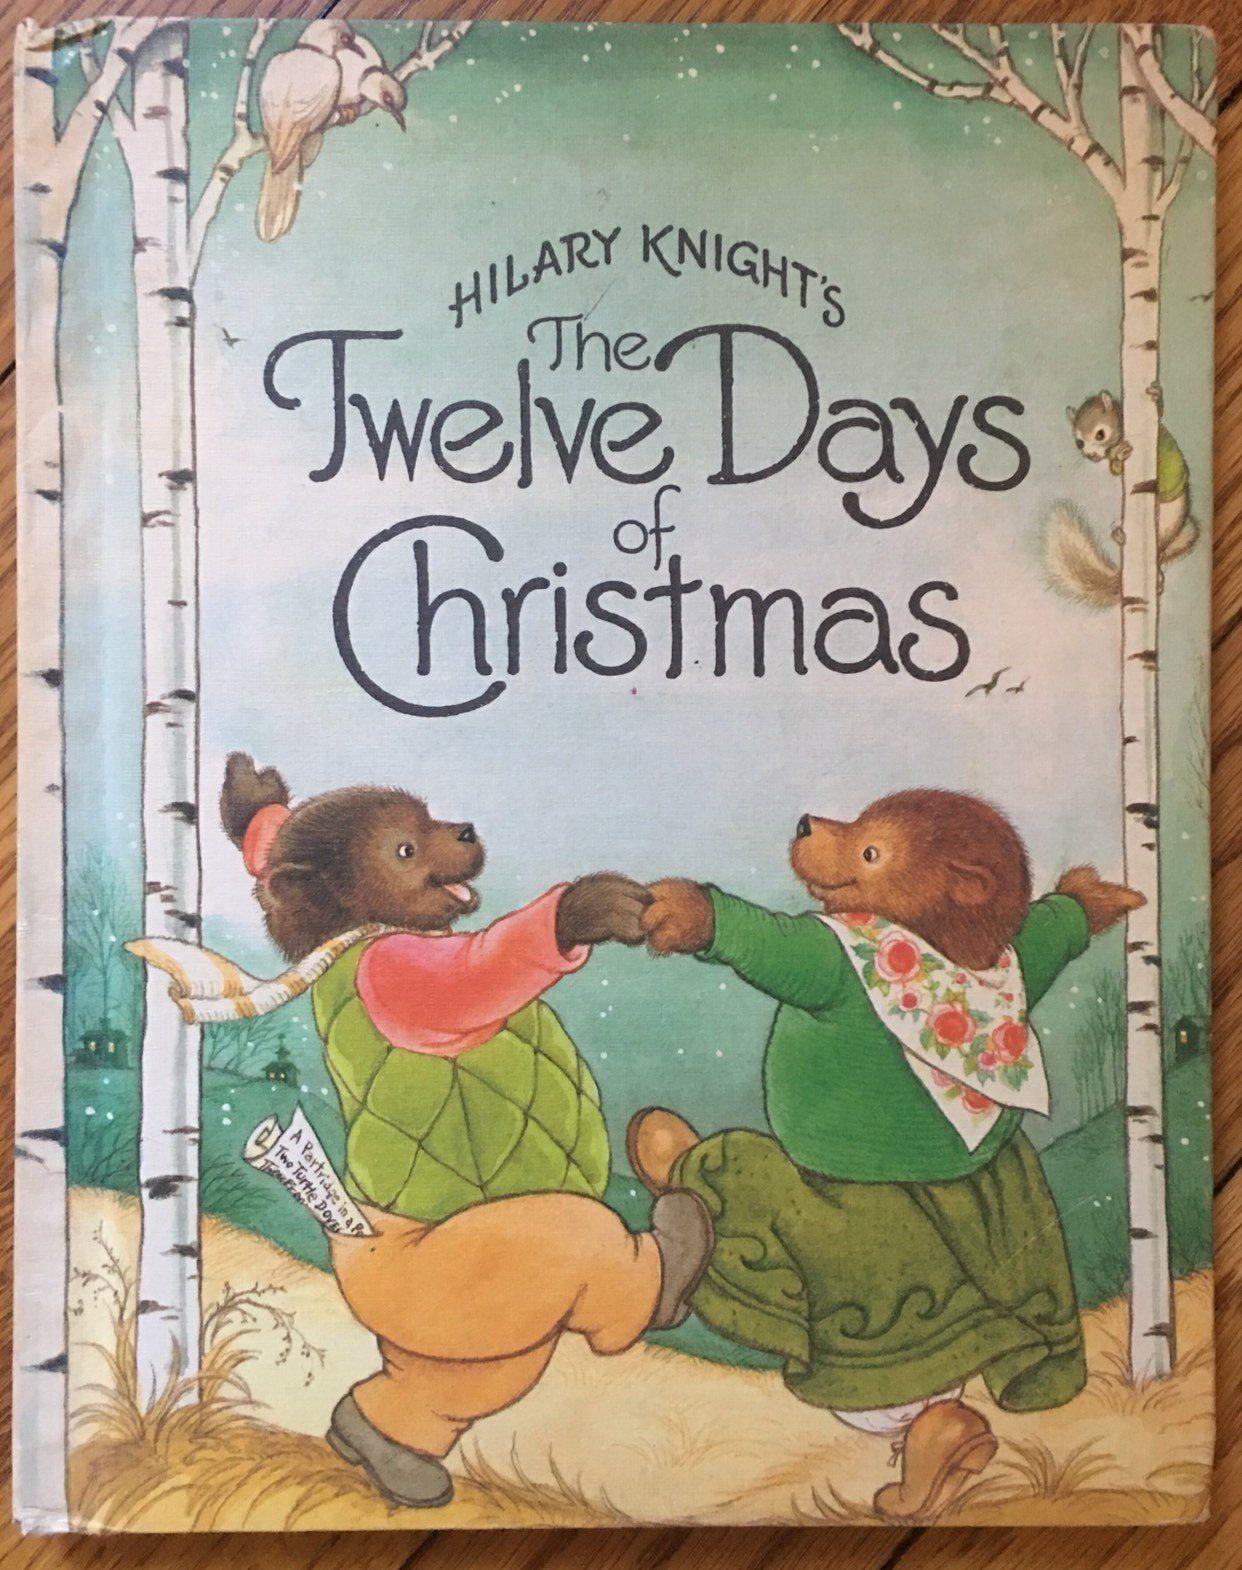 Hilary Knight's The Twelve Days of Christmas, 1981